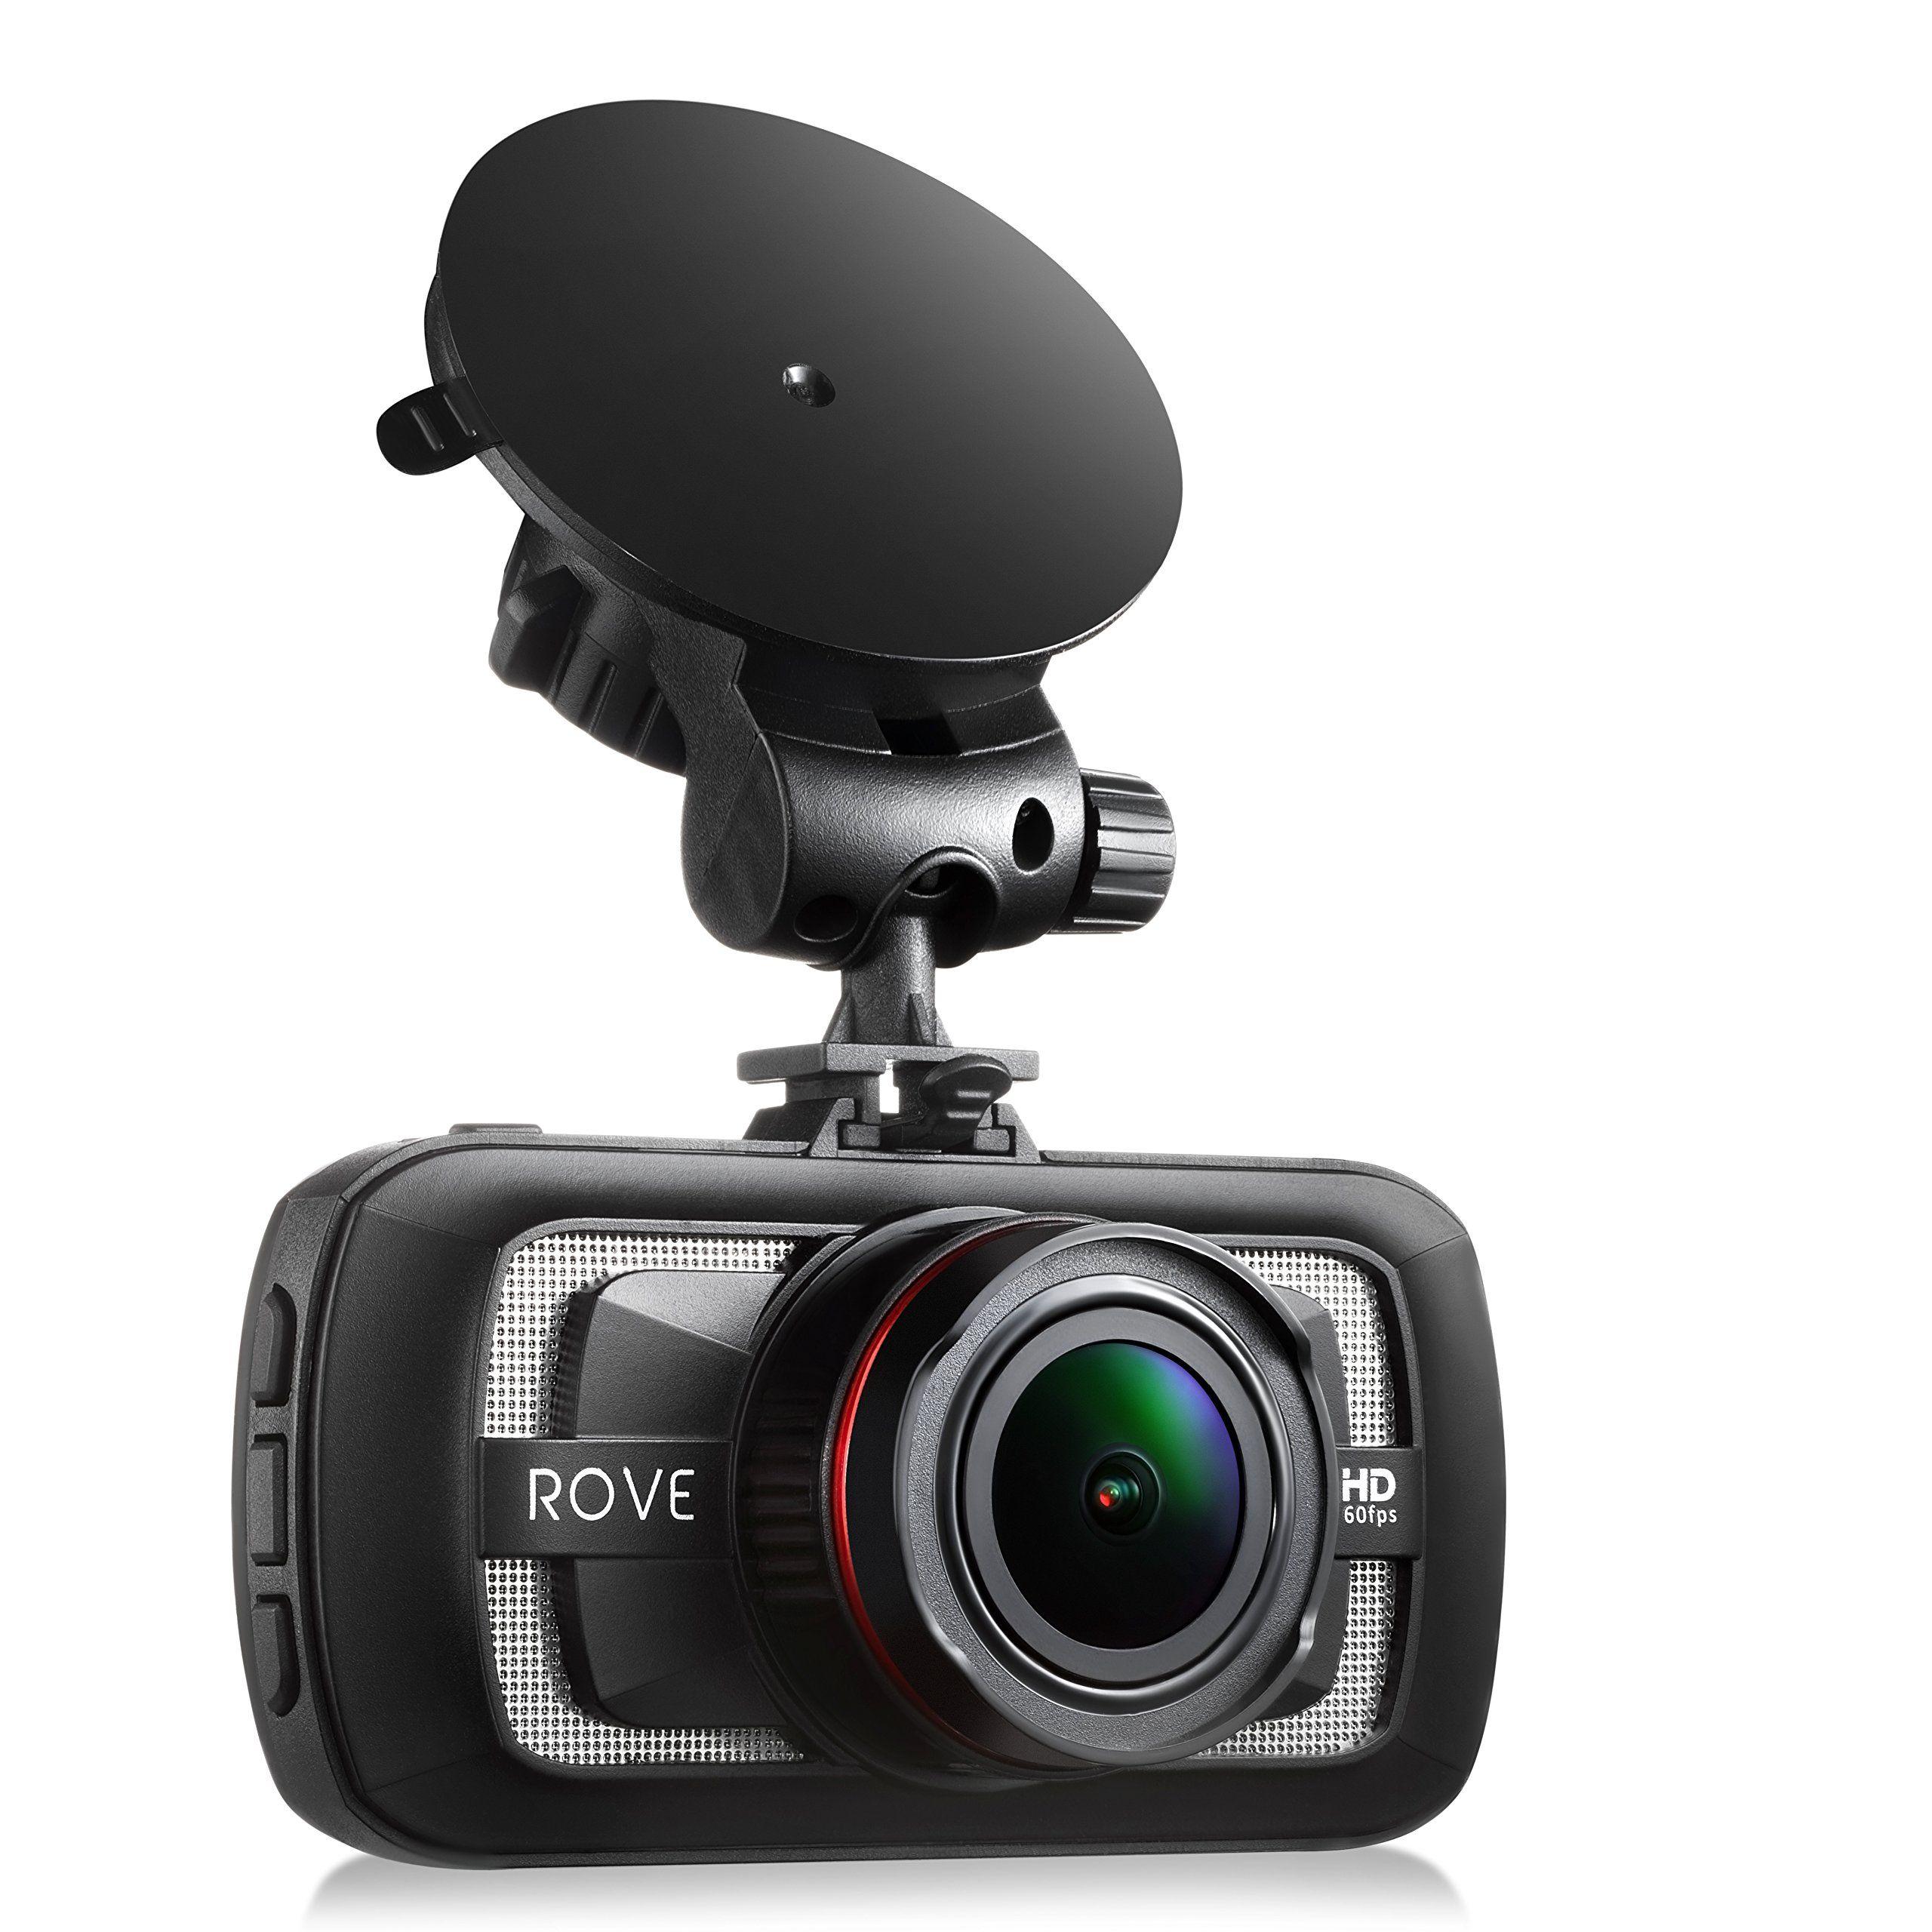 Rove A12-60 - 2 7K Quad HD 1440P at 60fps- Car Dash Cam HDR Superior